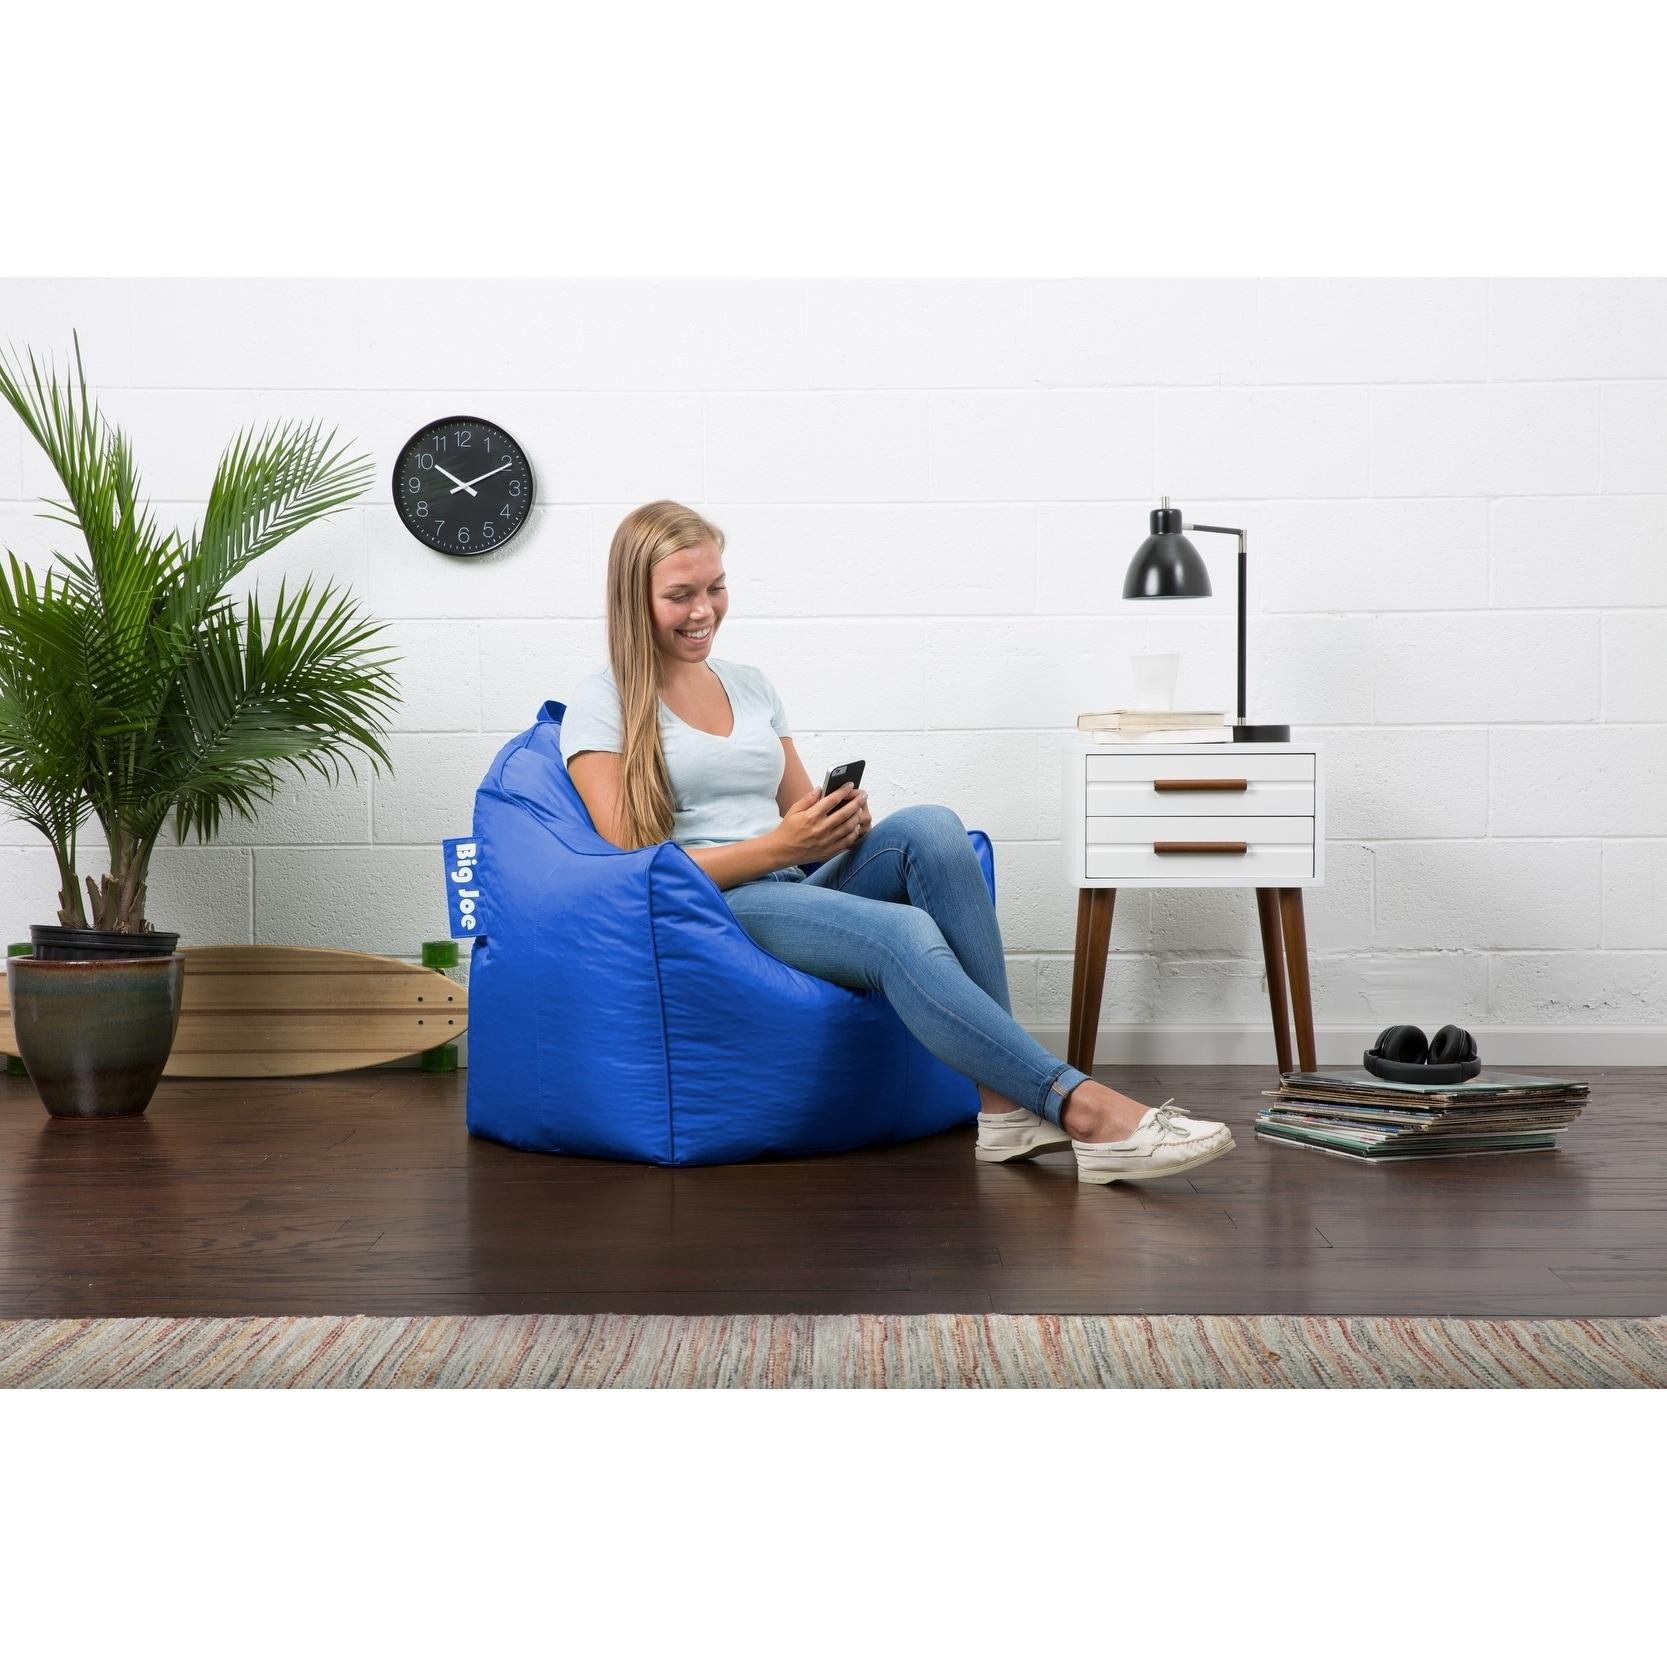 Pleasing Big Joe Hug Bean Bag Chair Cjindustries Chair Design For Home Cjindustriesco